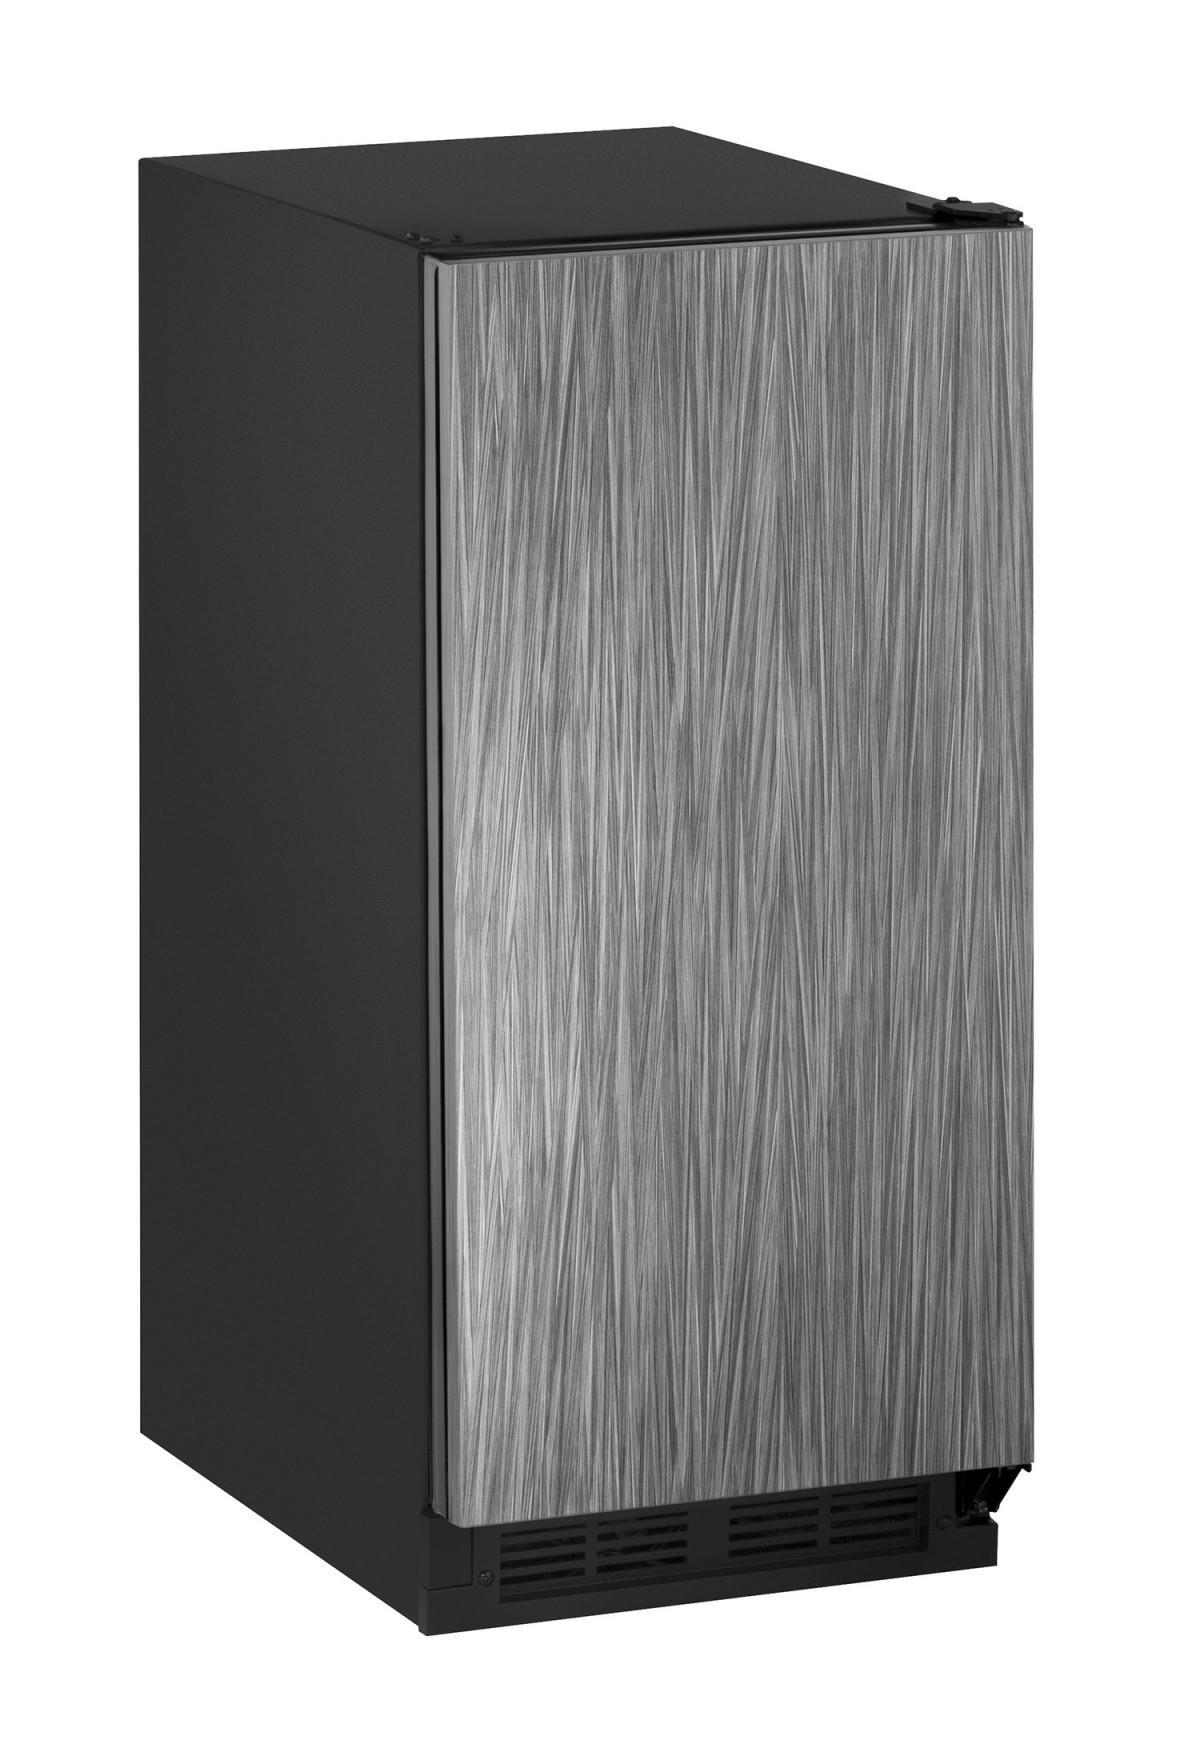 "U-Line Refrigerators 2.9 Cu. Ft. 15"" Compact All-Refrigerator - Item Number: U-1215RINT-00A"